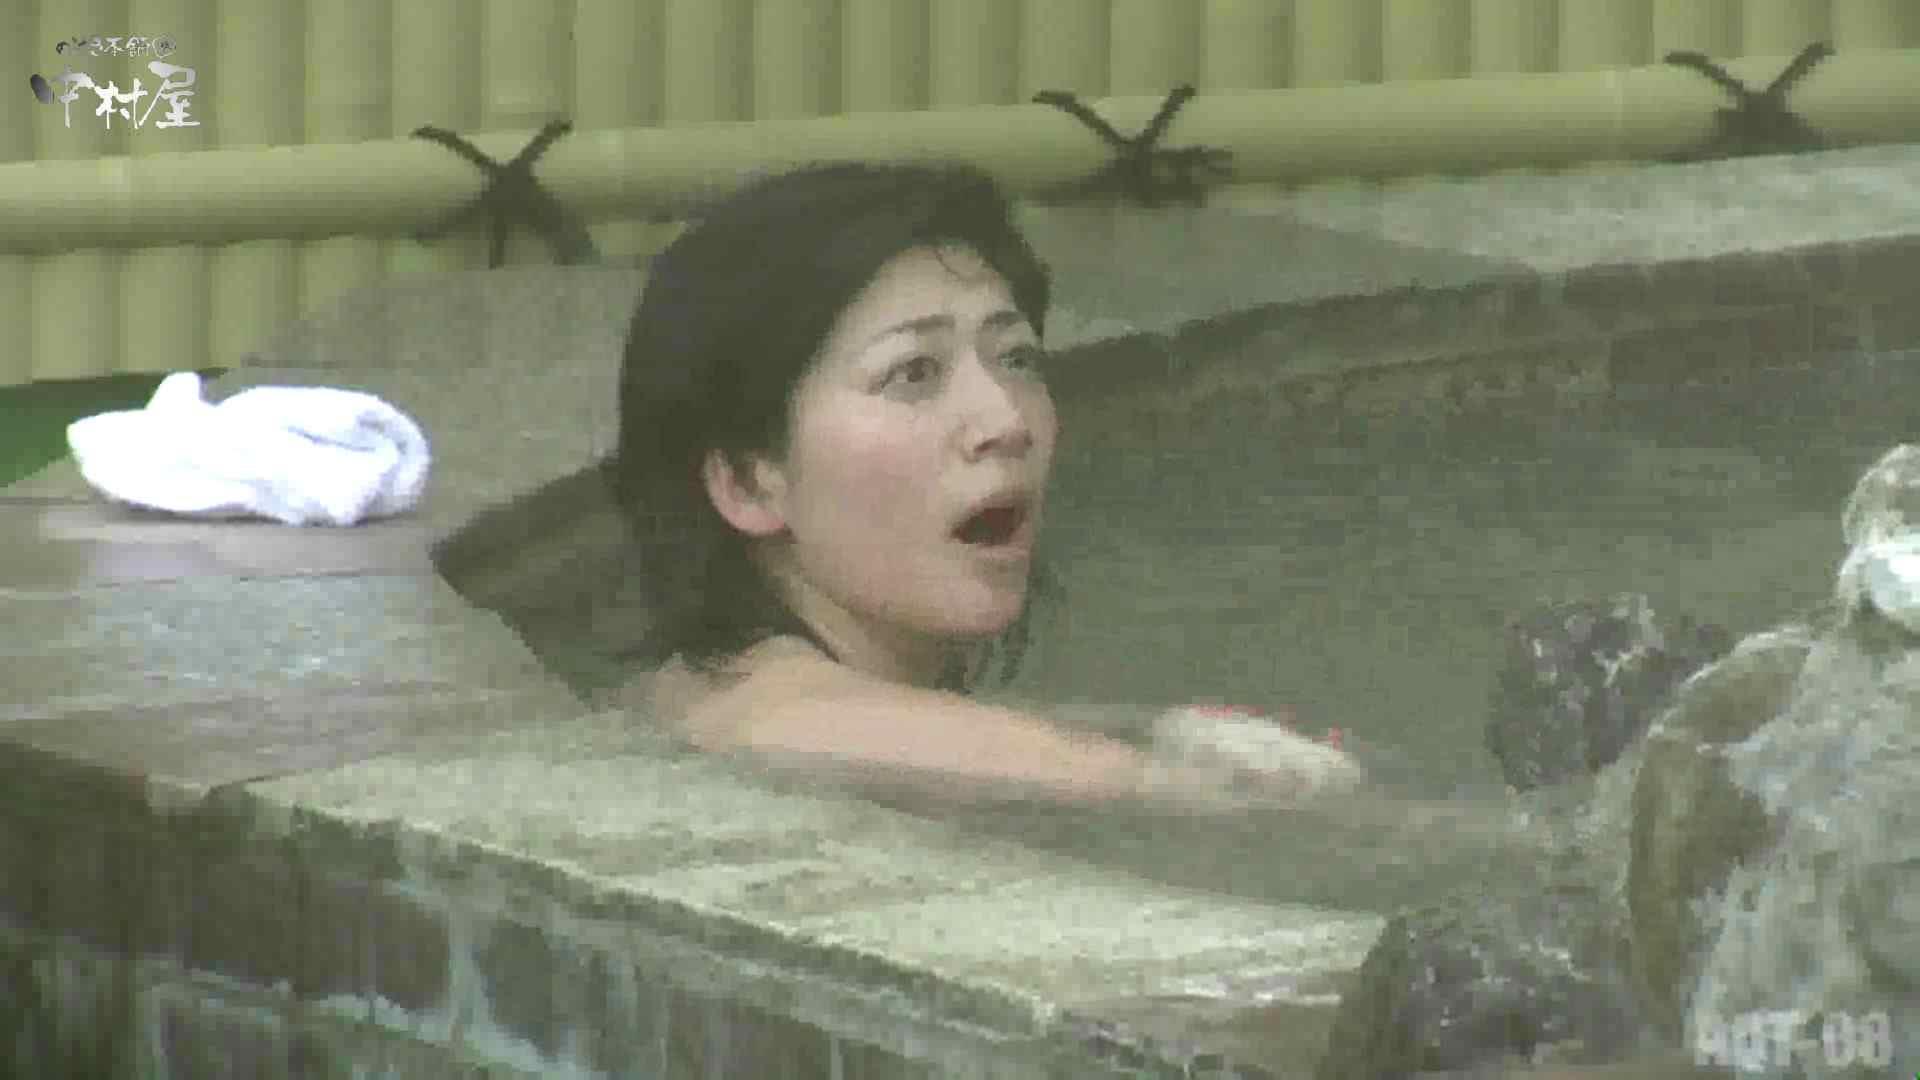 Aquaな露天風呂Vol.872潜入盗撮露天風呂八判湯 其の四 OL女体 | 女体盗撮  92連発 73